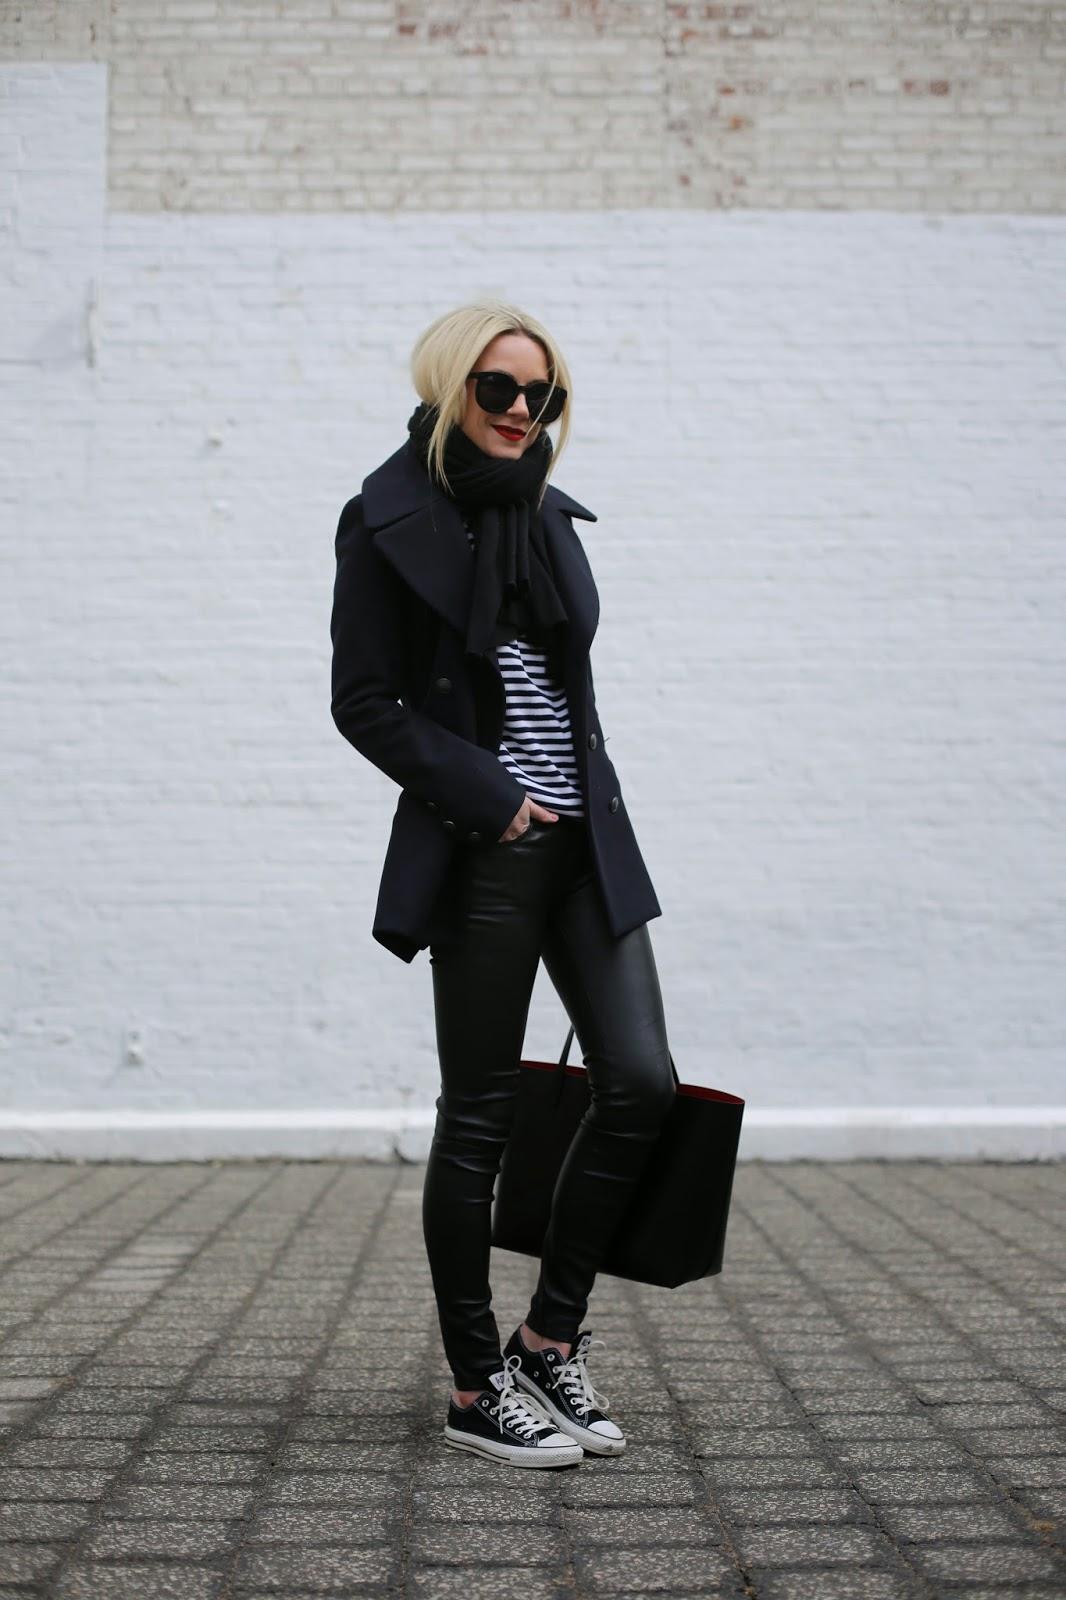 Blonde lady wearing black converse